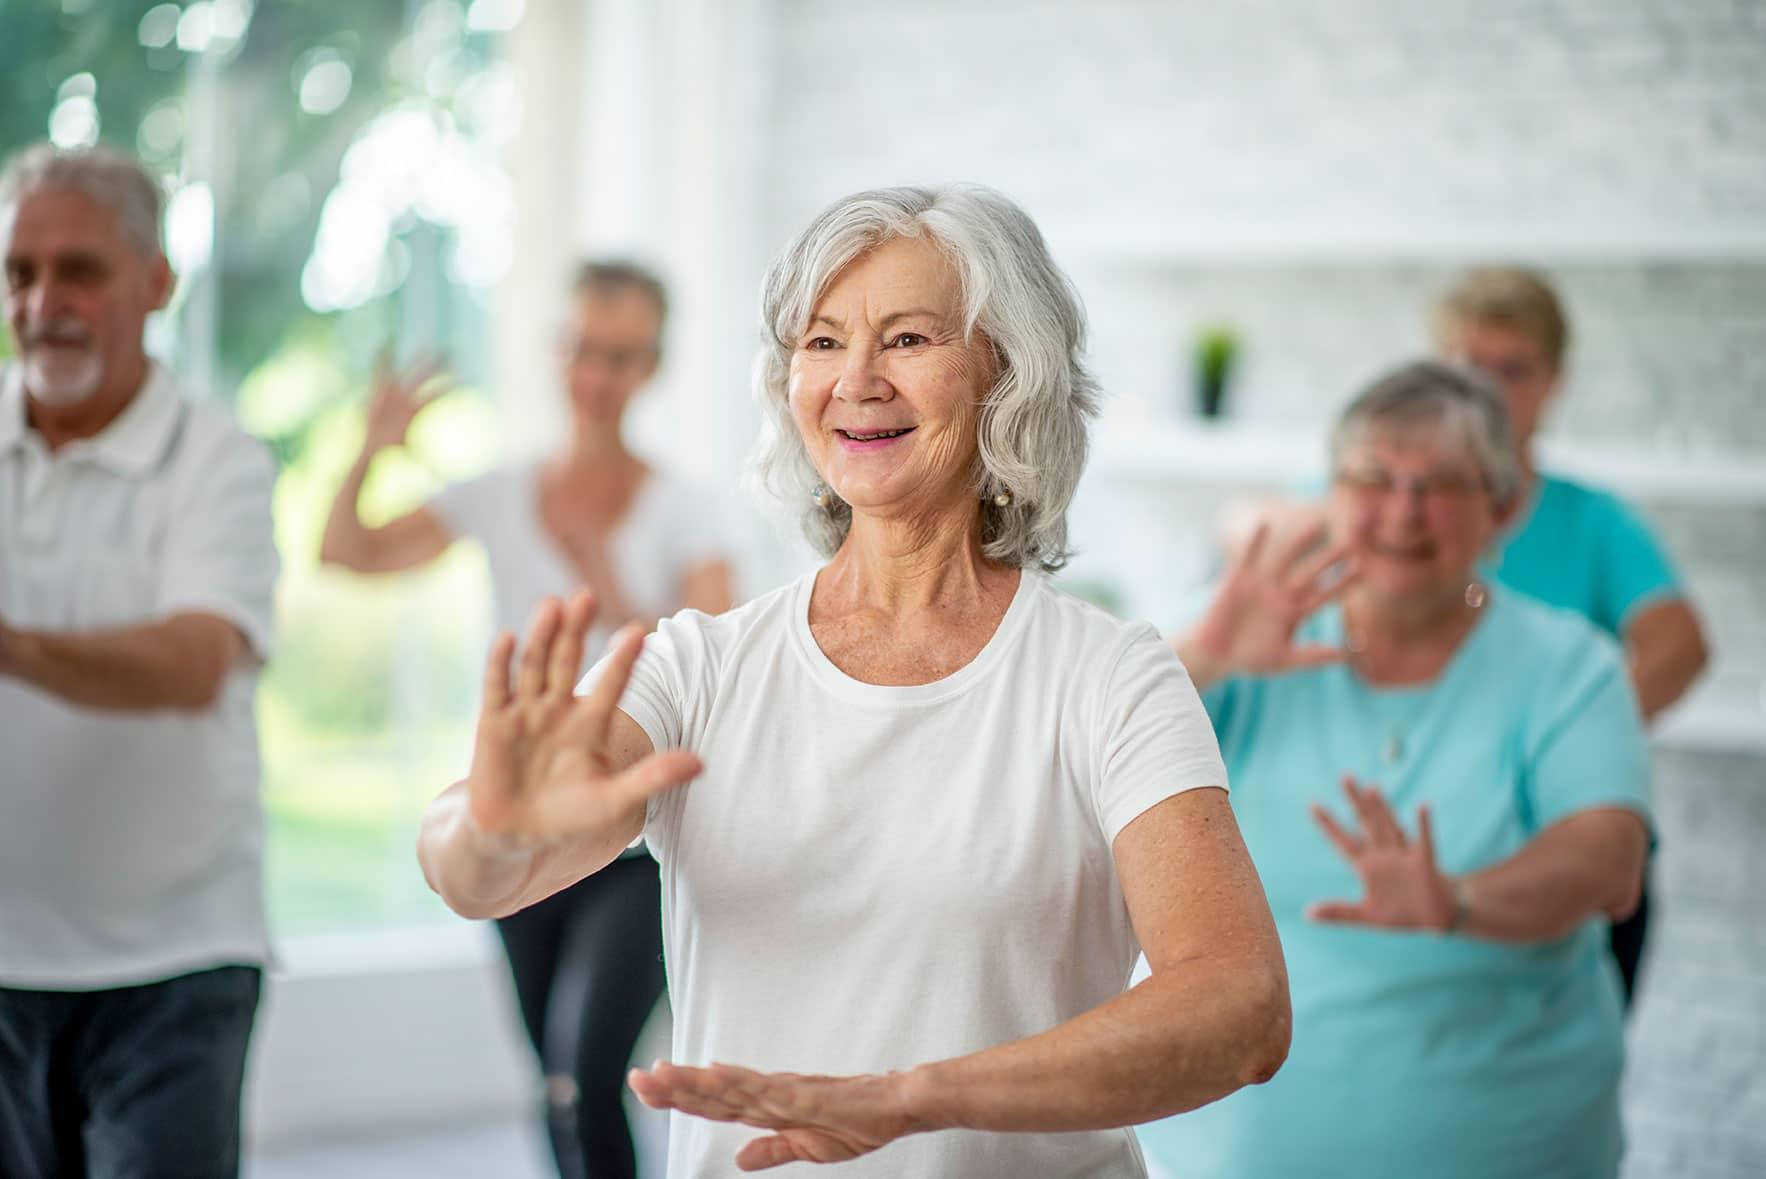 Senior woman practicing yoga inside